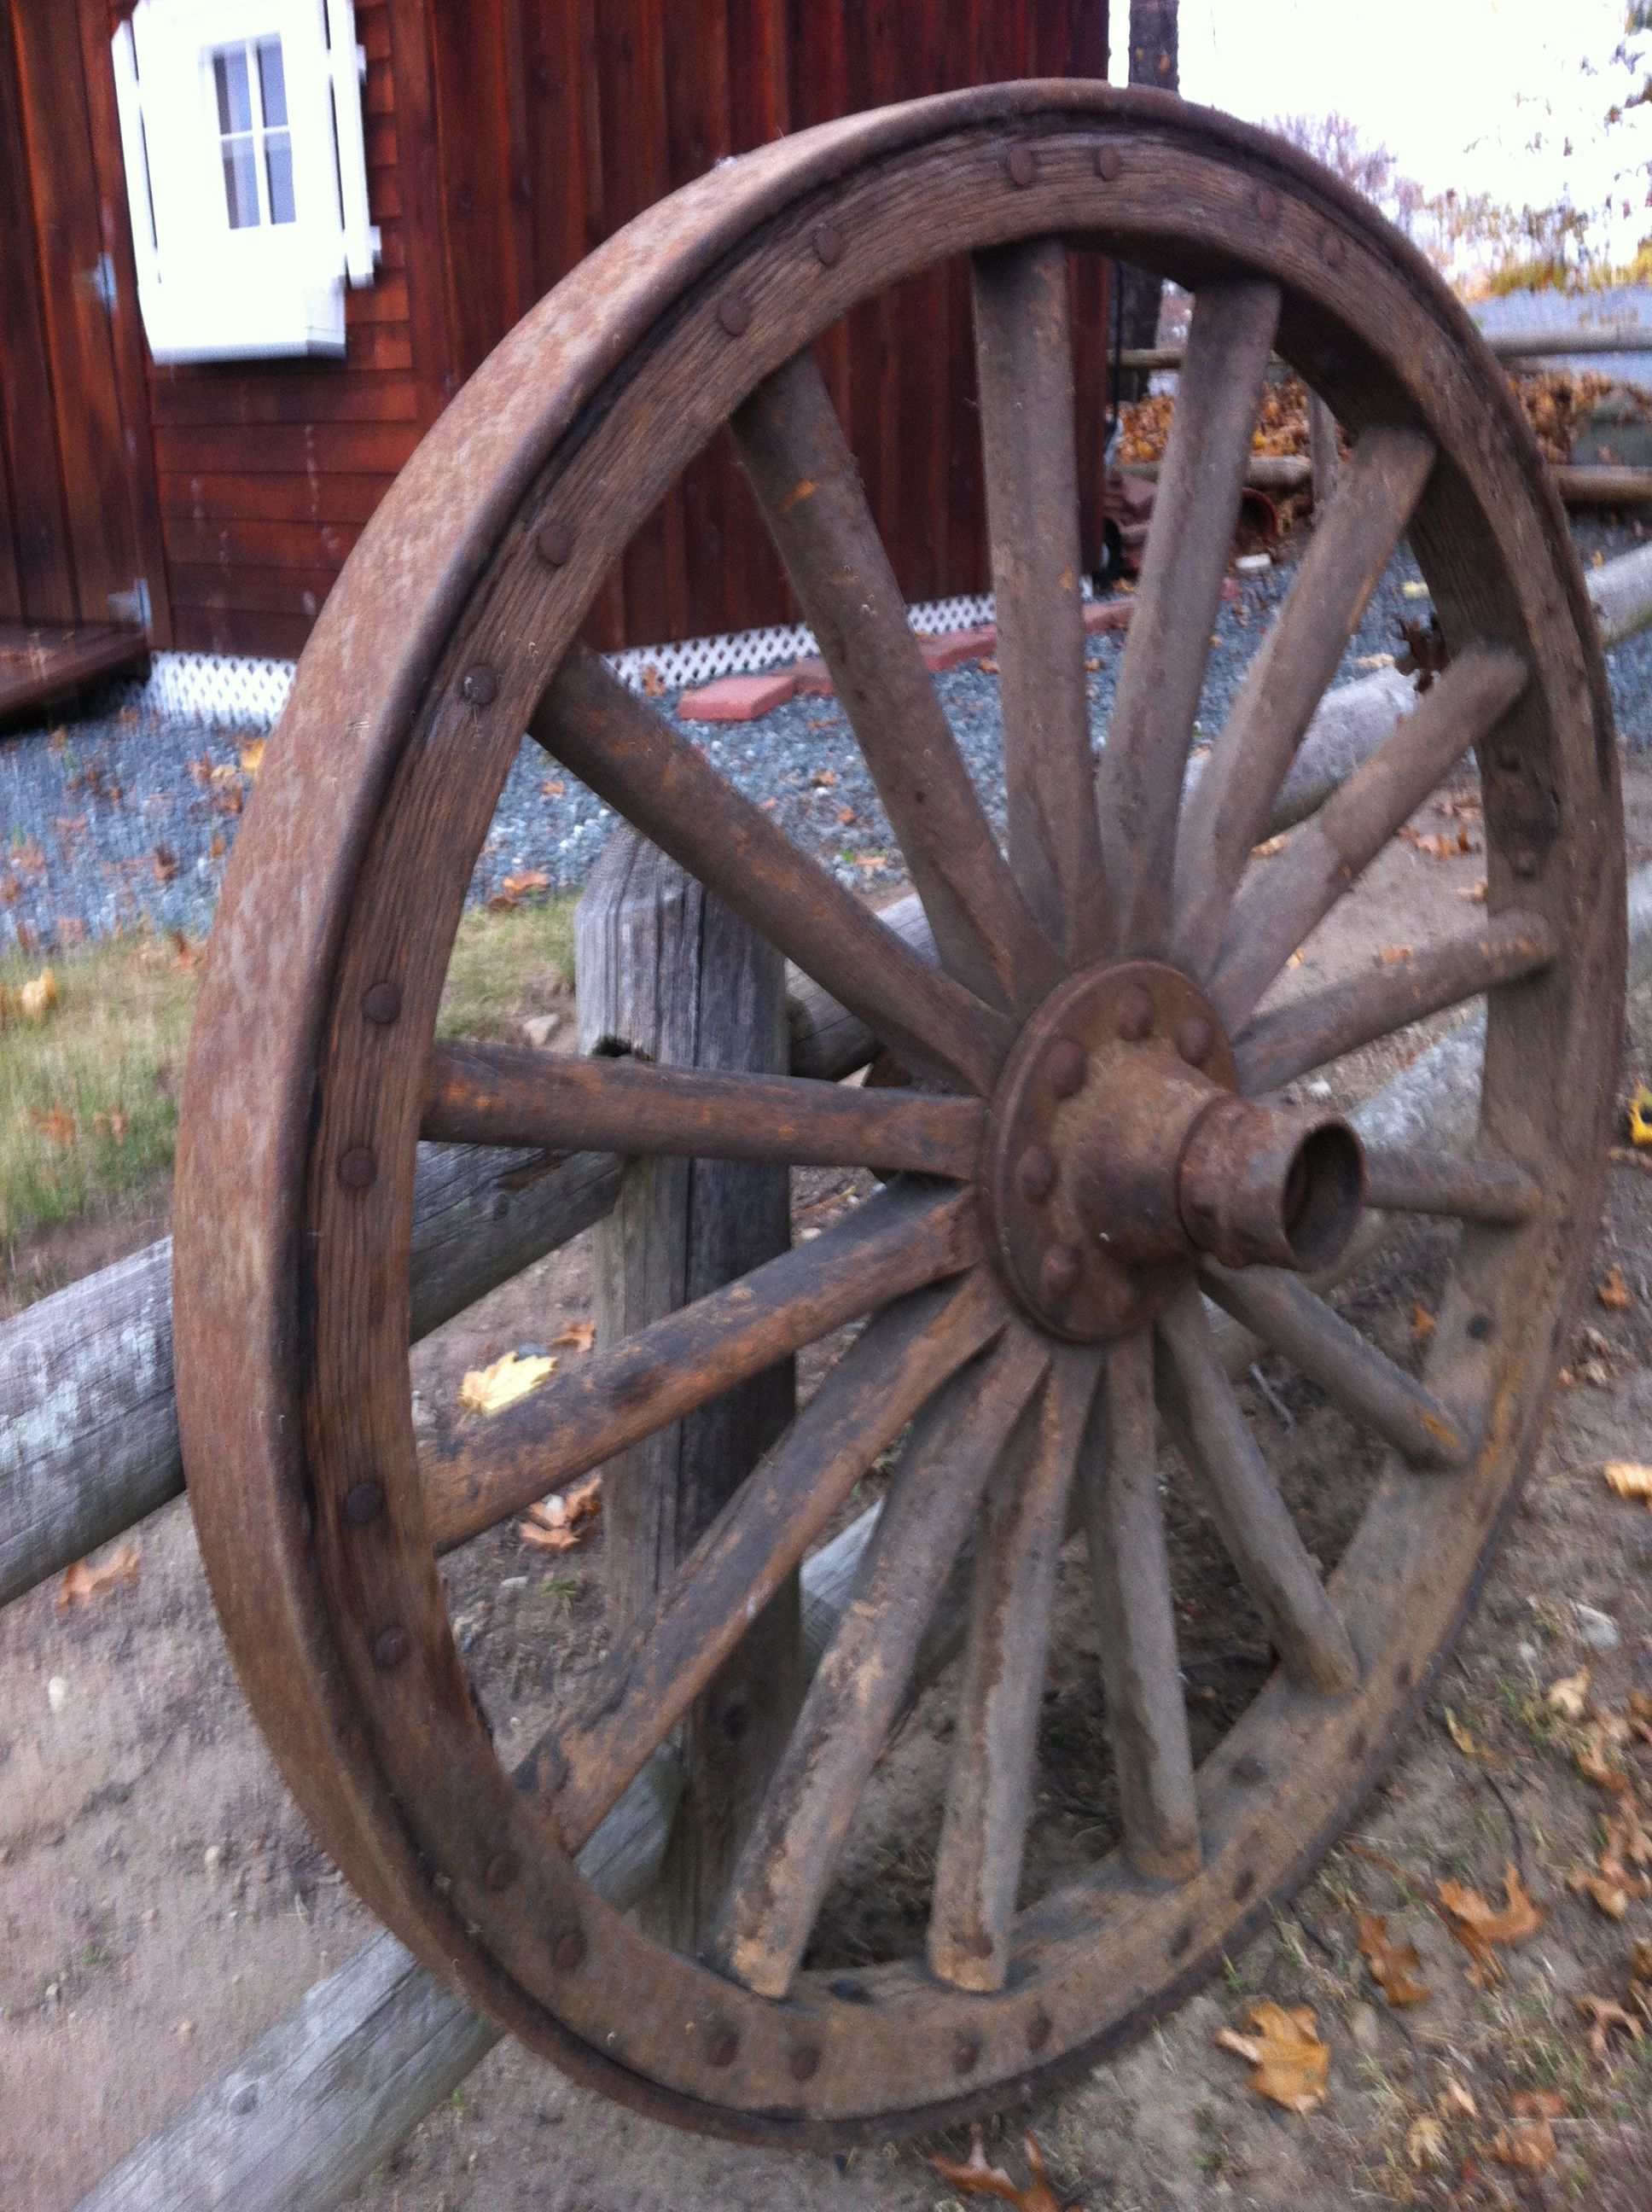 Antique Wagon Wheels For Sale Massachusetts 150 00 Each